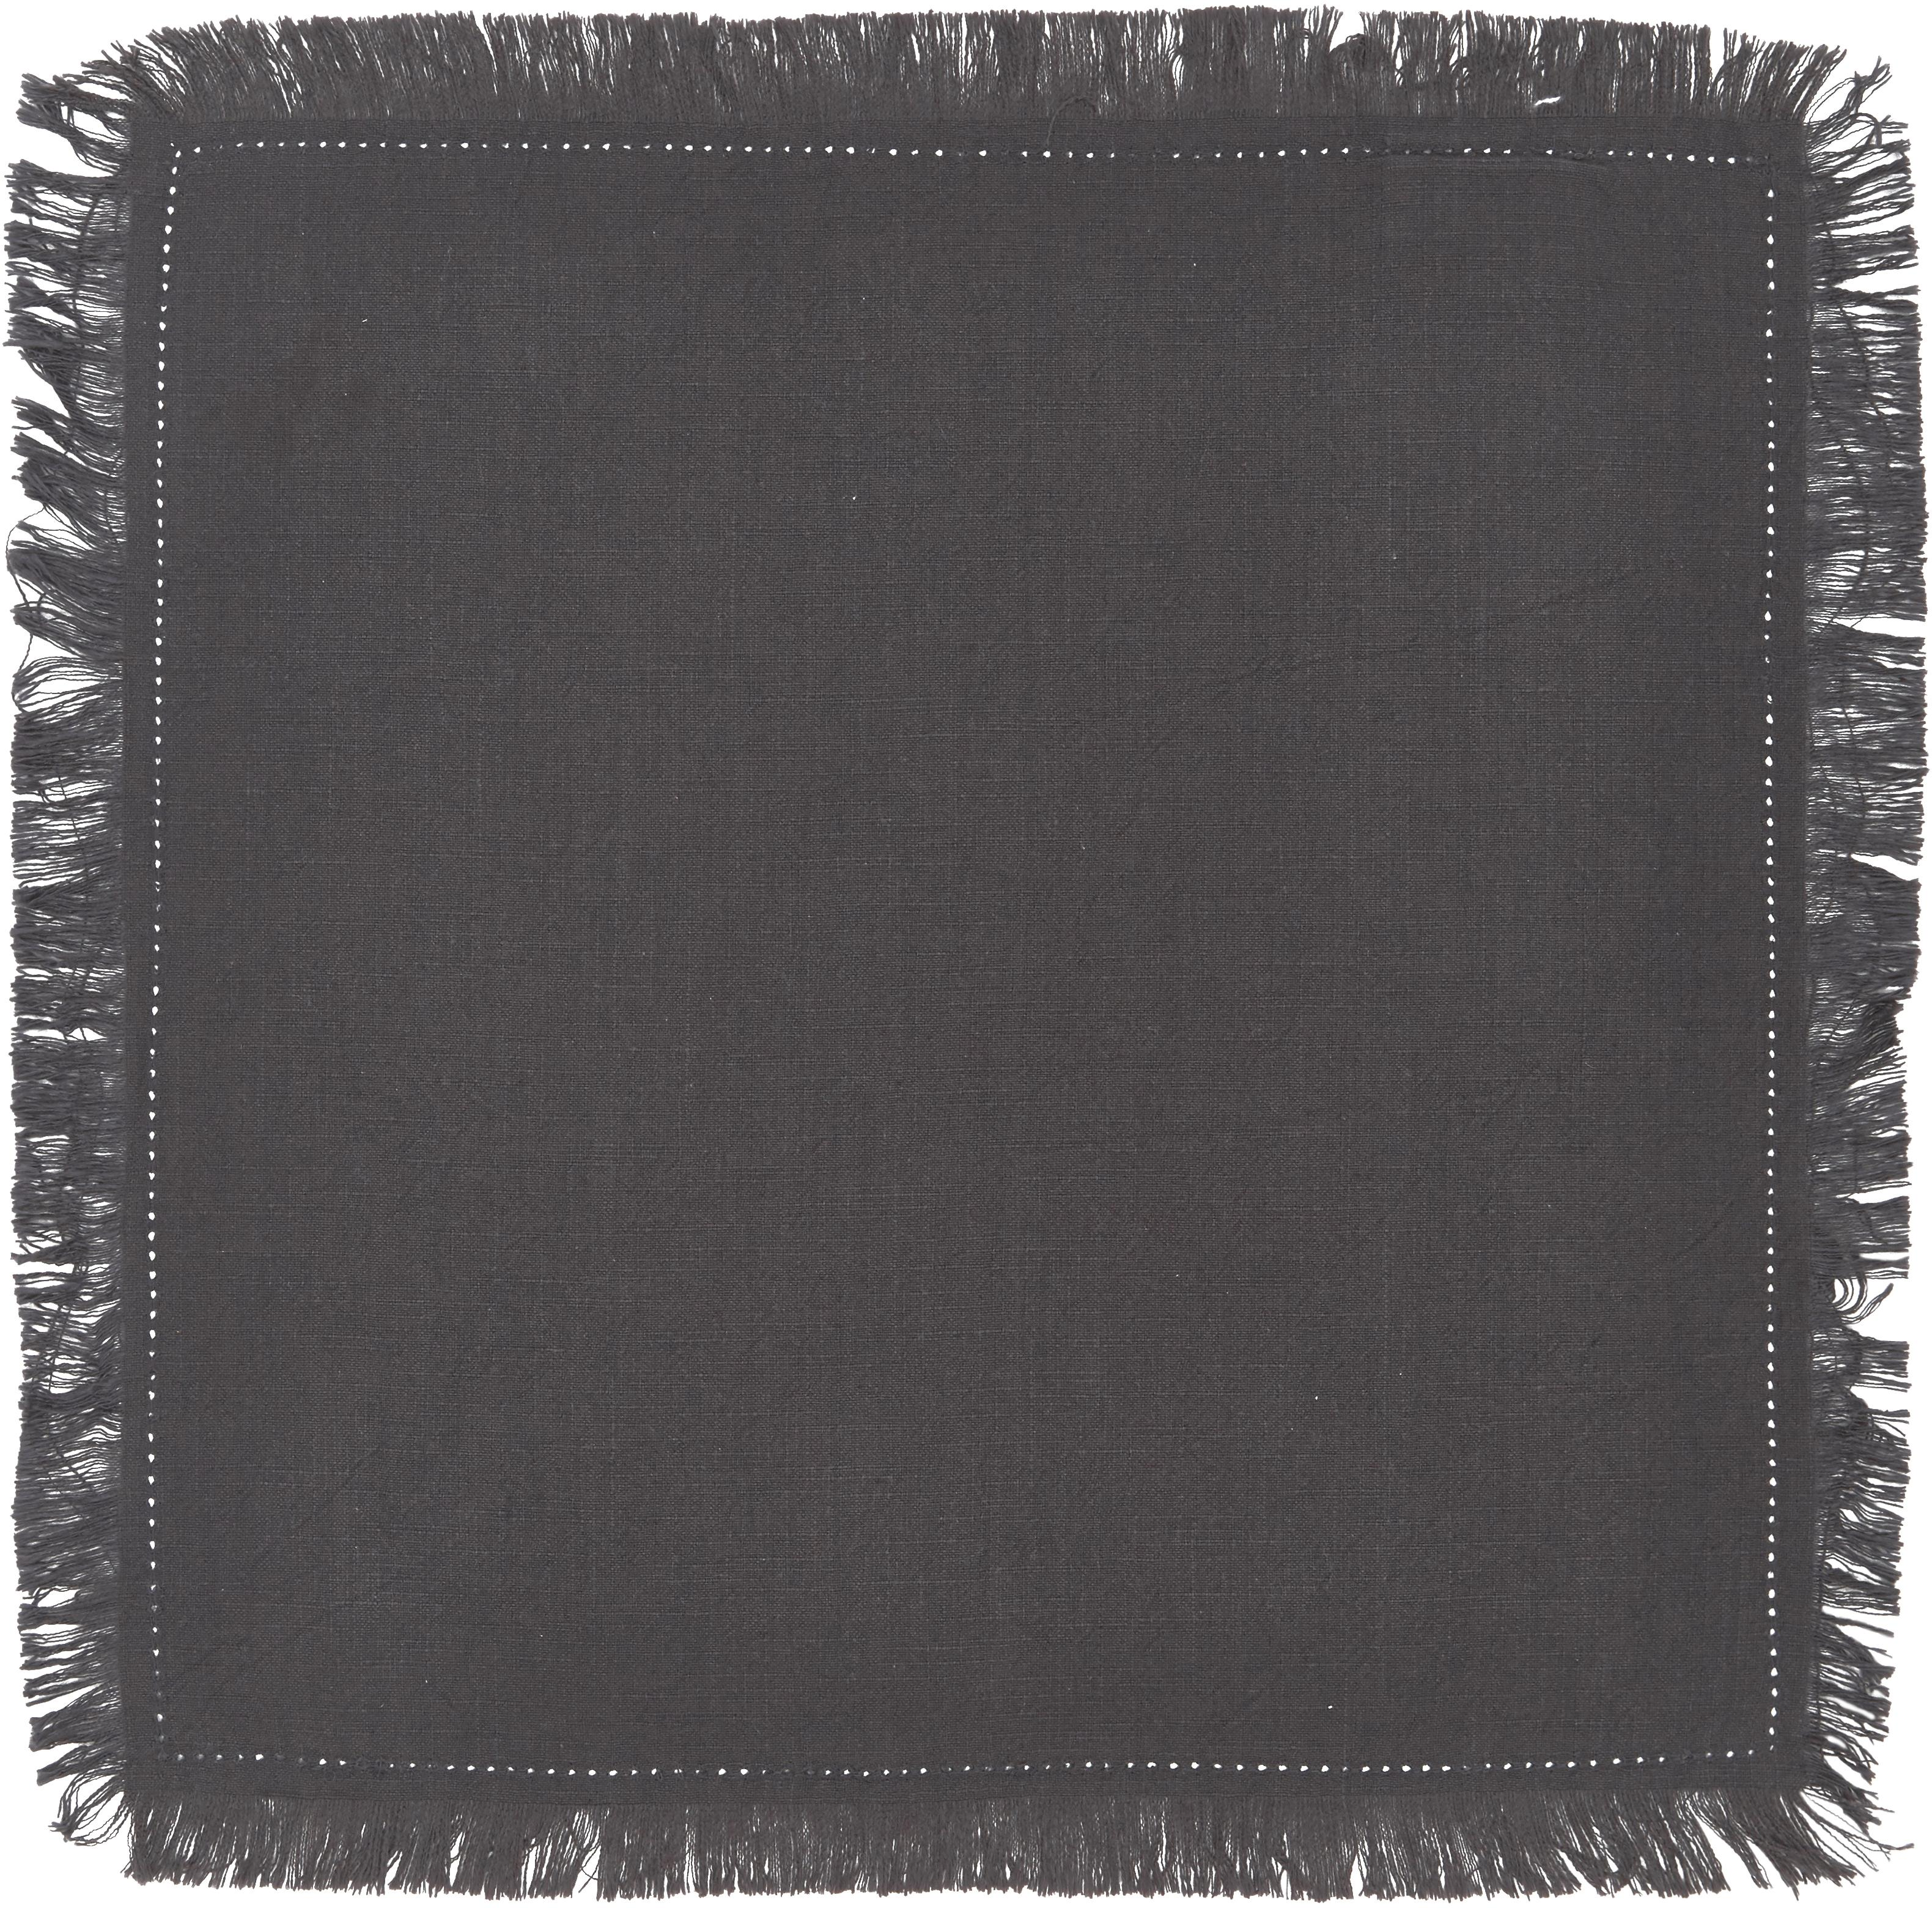 Servilletas de algodón Hilma, 2uds., Algodón, Negro, An 45 x L 45 cm